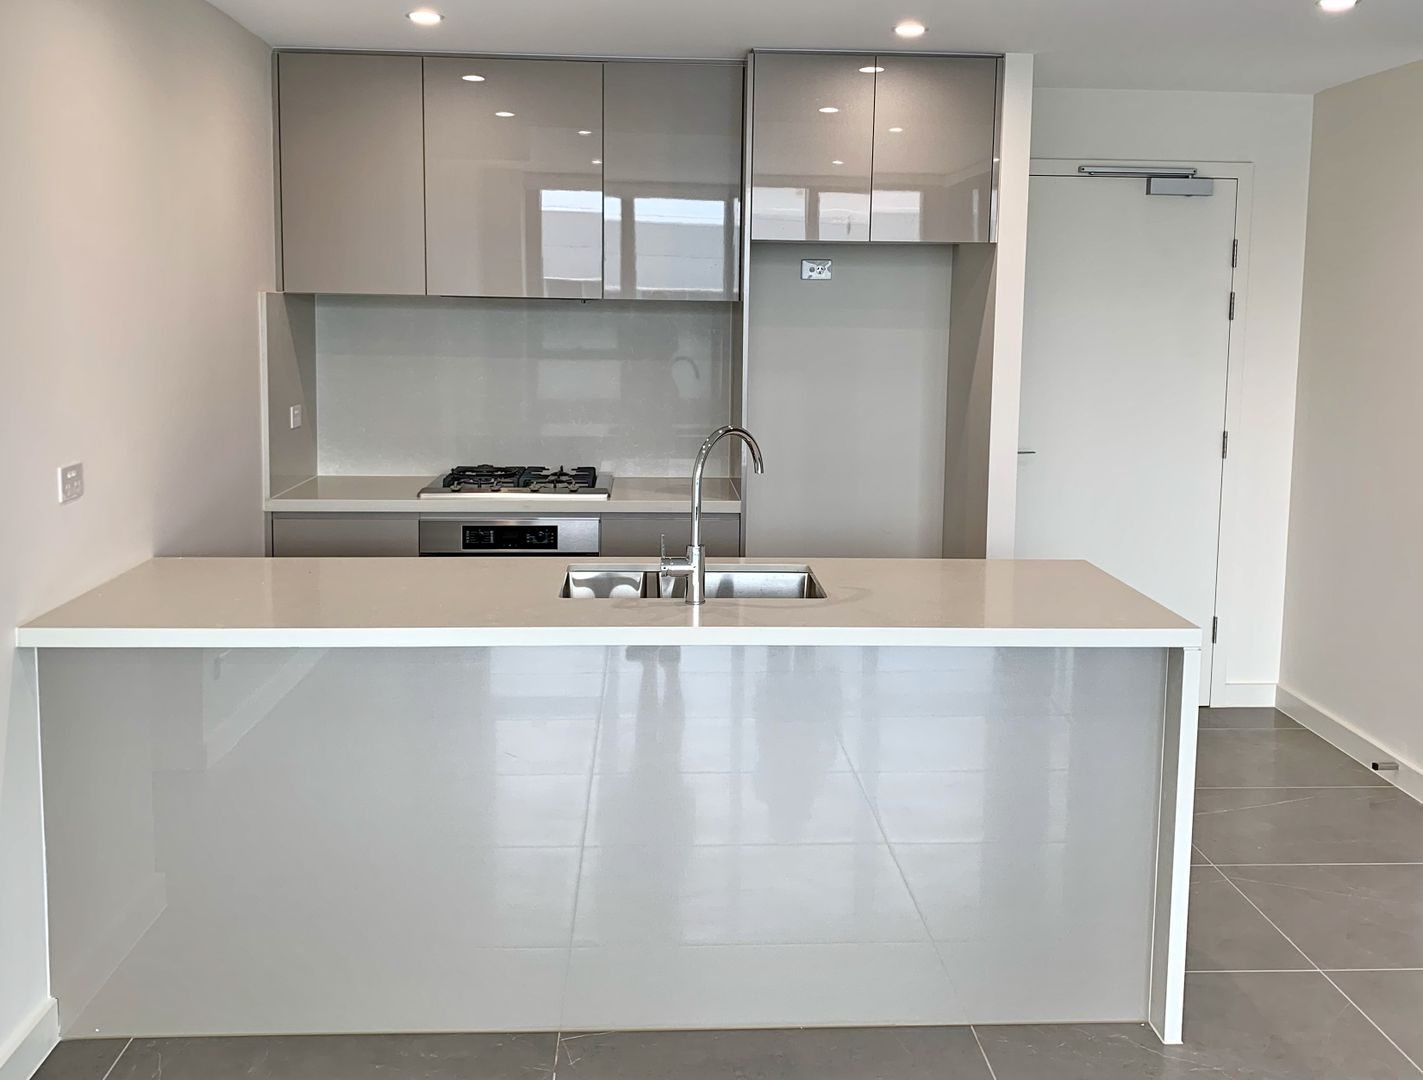 706/101 Waterloo Rd, Macquarie Park NSW 2113, Image 0